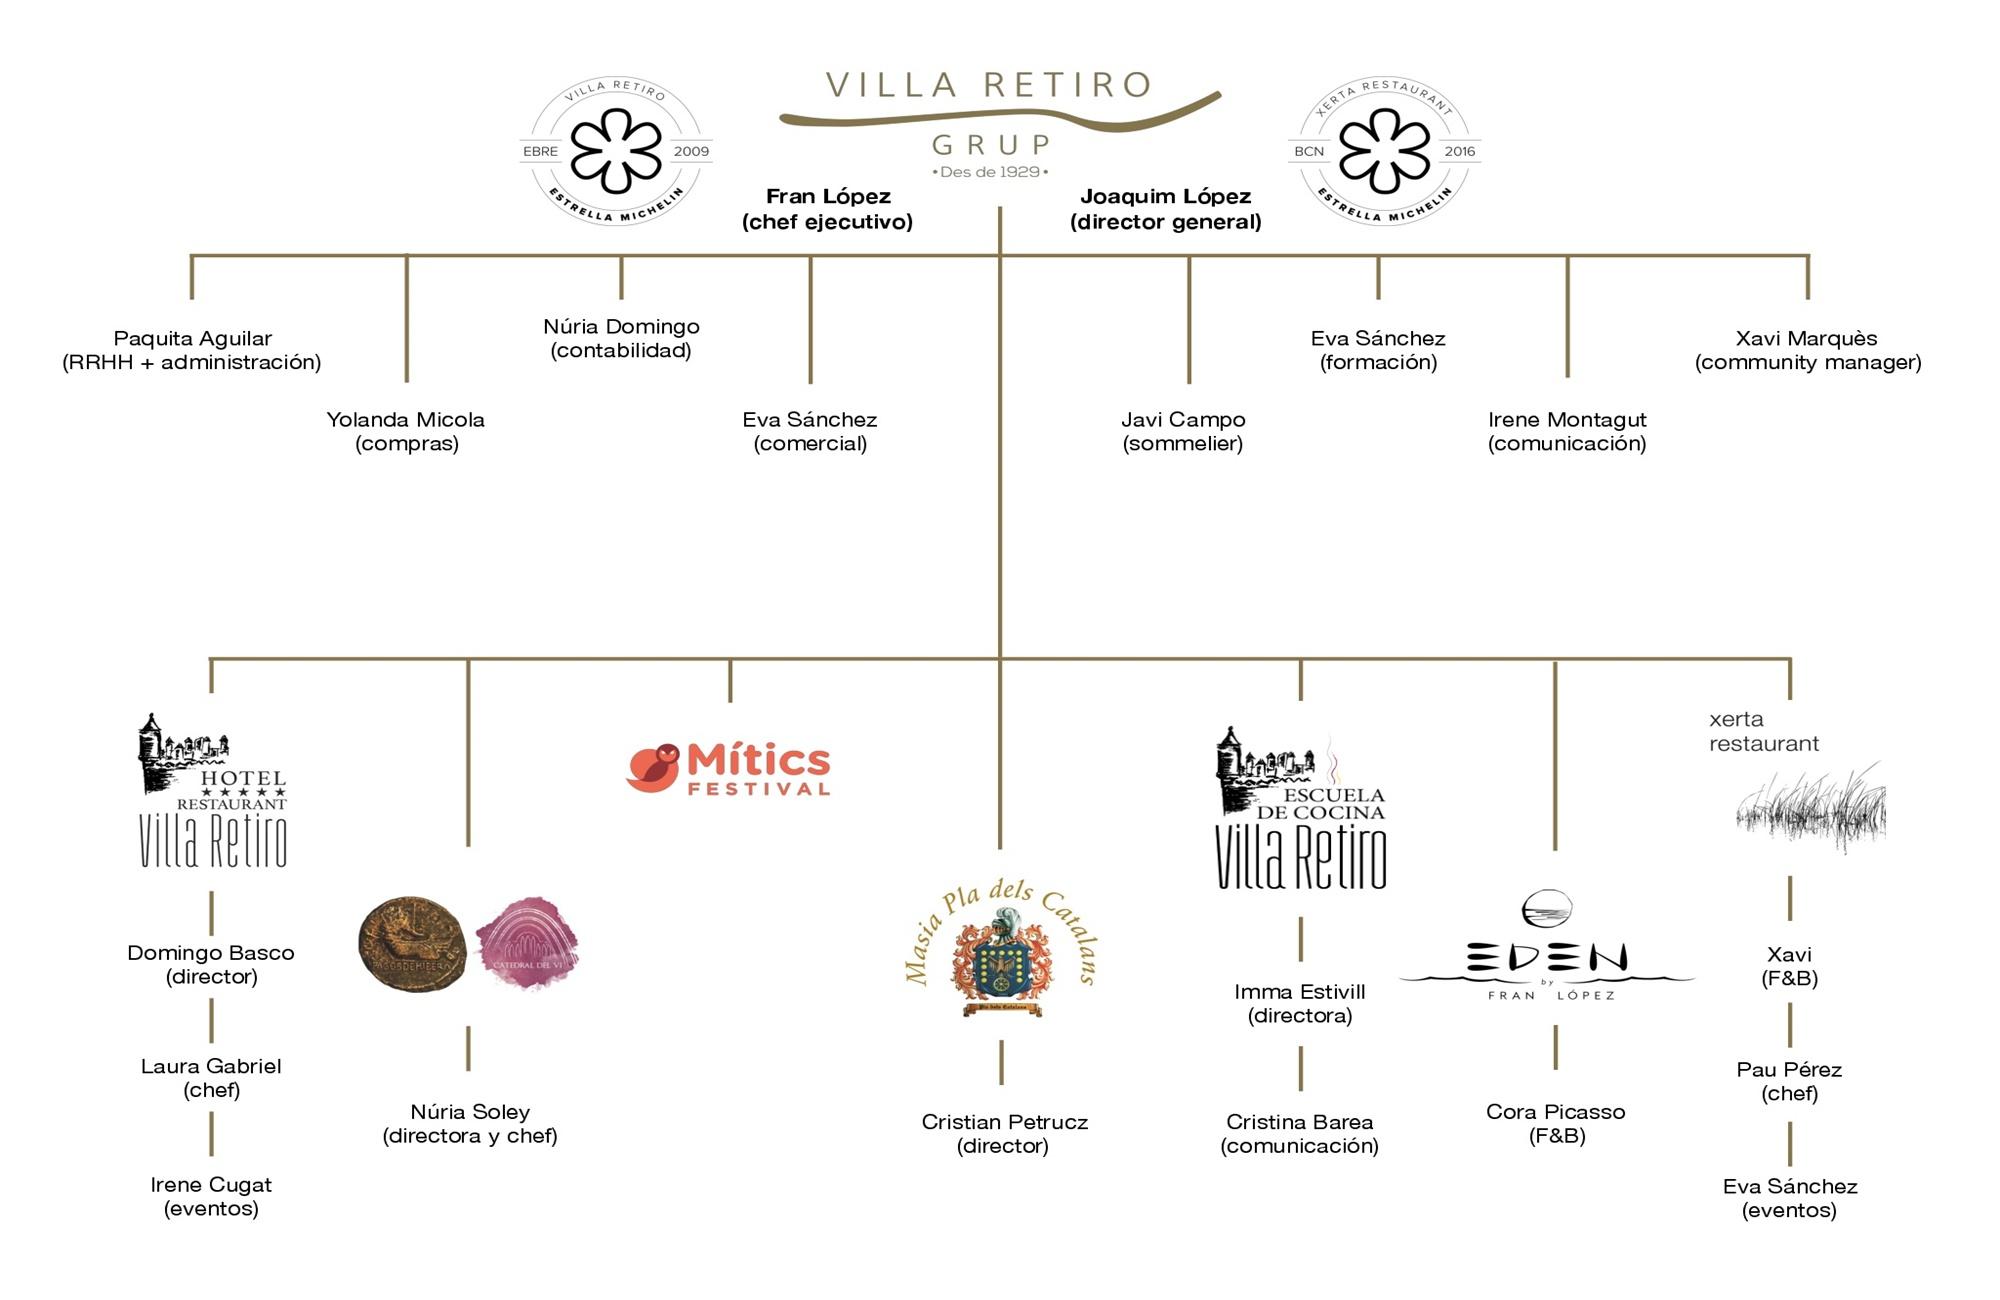 organigrama villa retiro grup- hotel villa retiro-xerta restaurant-catedral del vi- pladels catalasn-mitics-eden restaurante